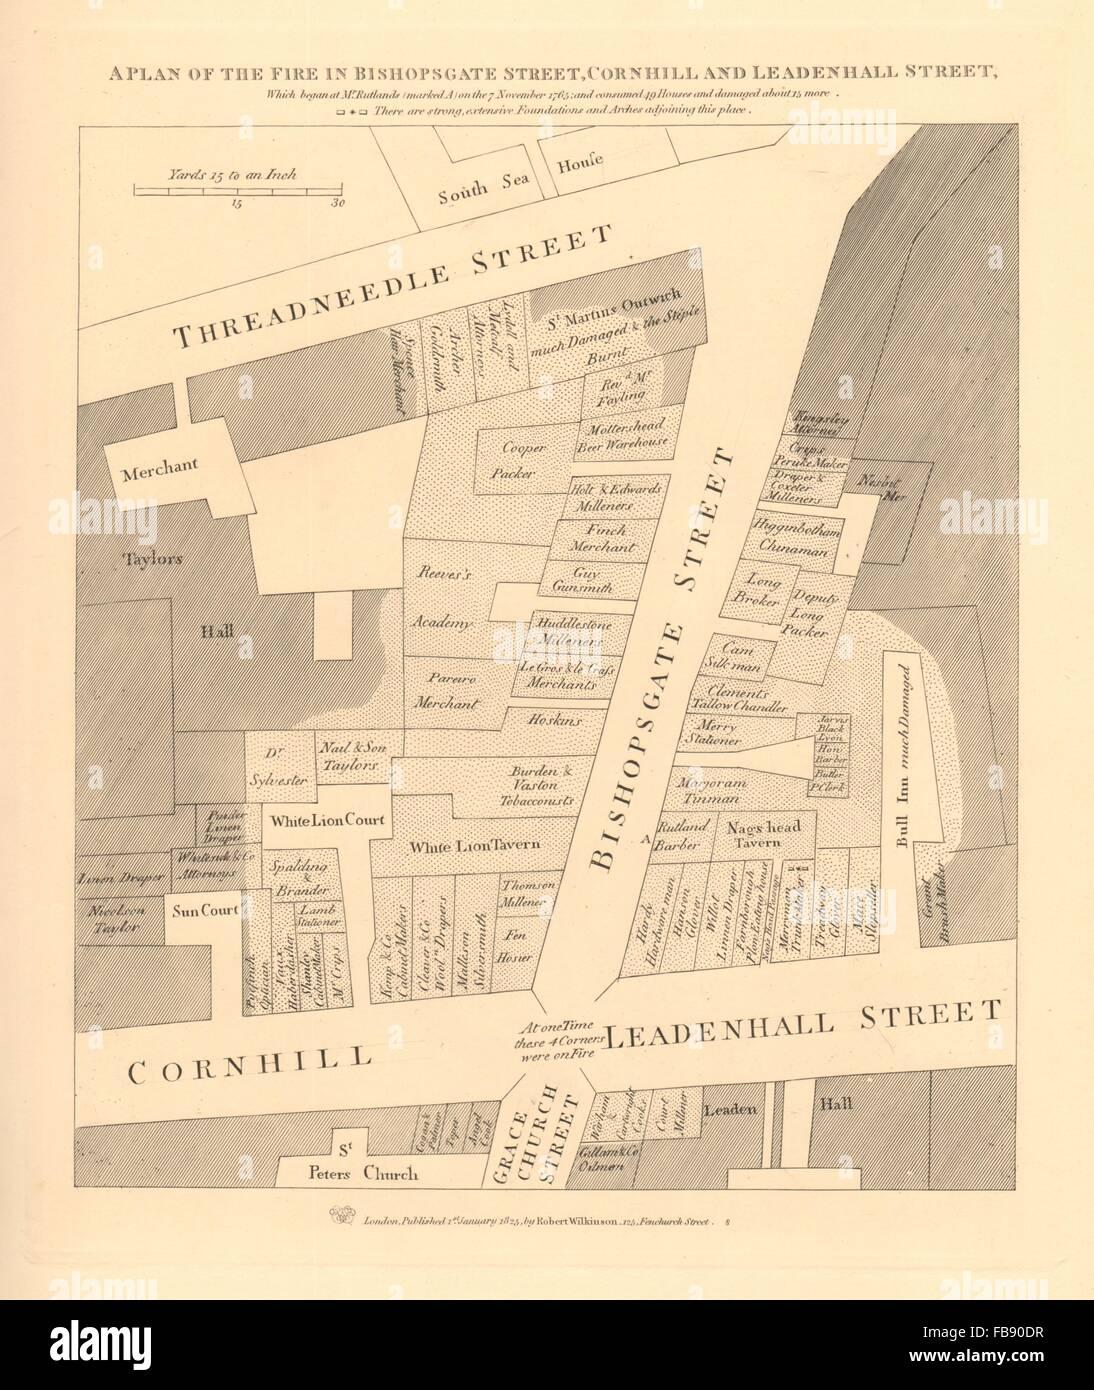 A plan of the 1765 BISHOPSGATE STREET FIRE. Cornhill Threadneedle St., 1834 map - Stock Image